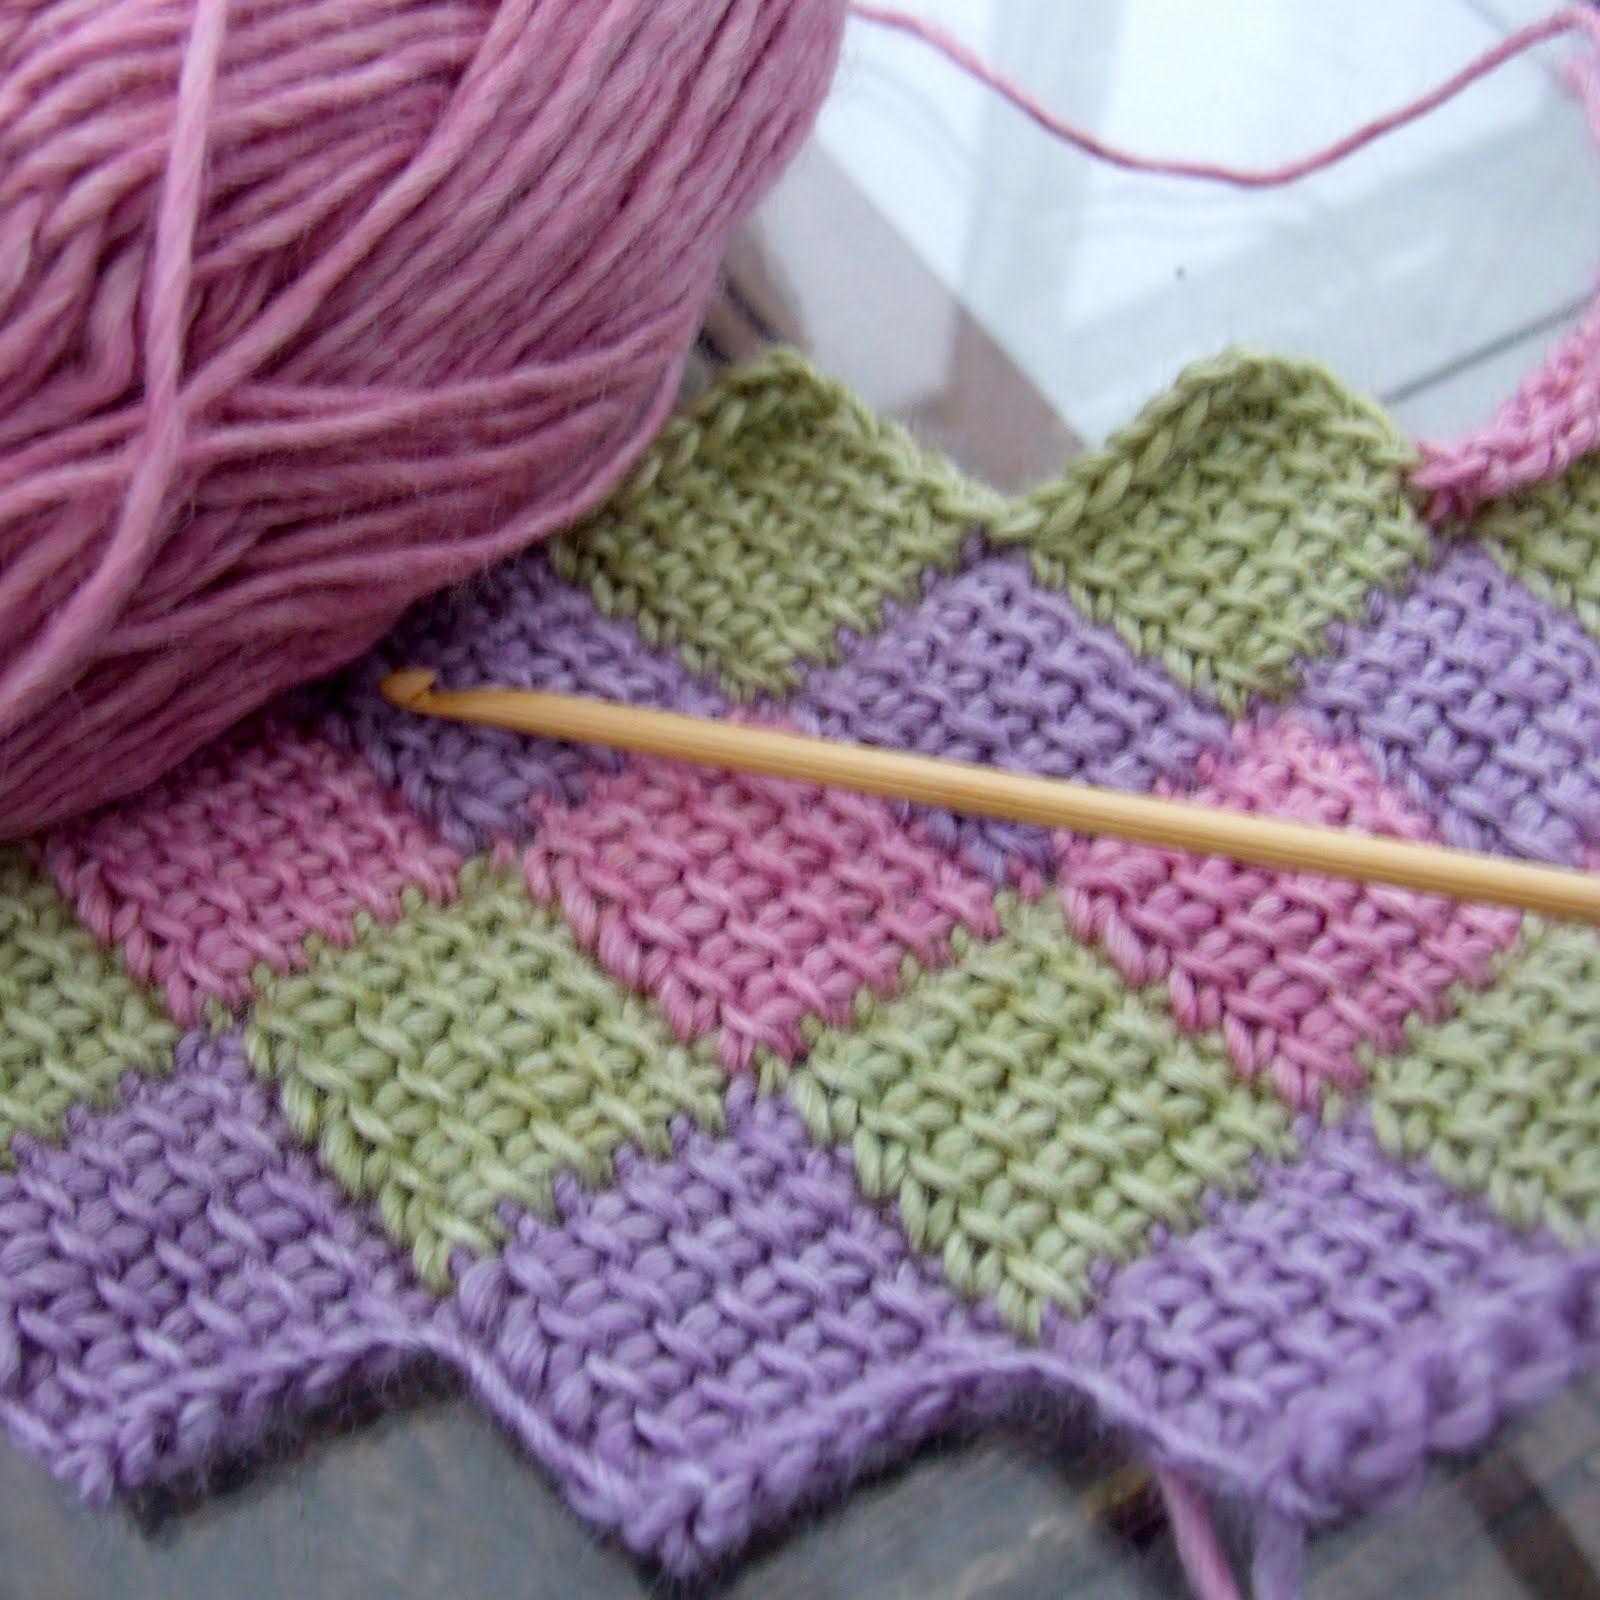 Tunesisches Häkeln | Stricken/Häkeln/Knitting/Crochet | Pinterest ...